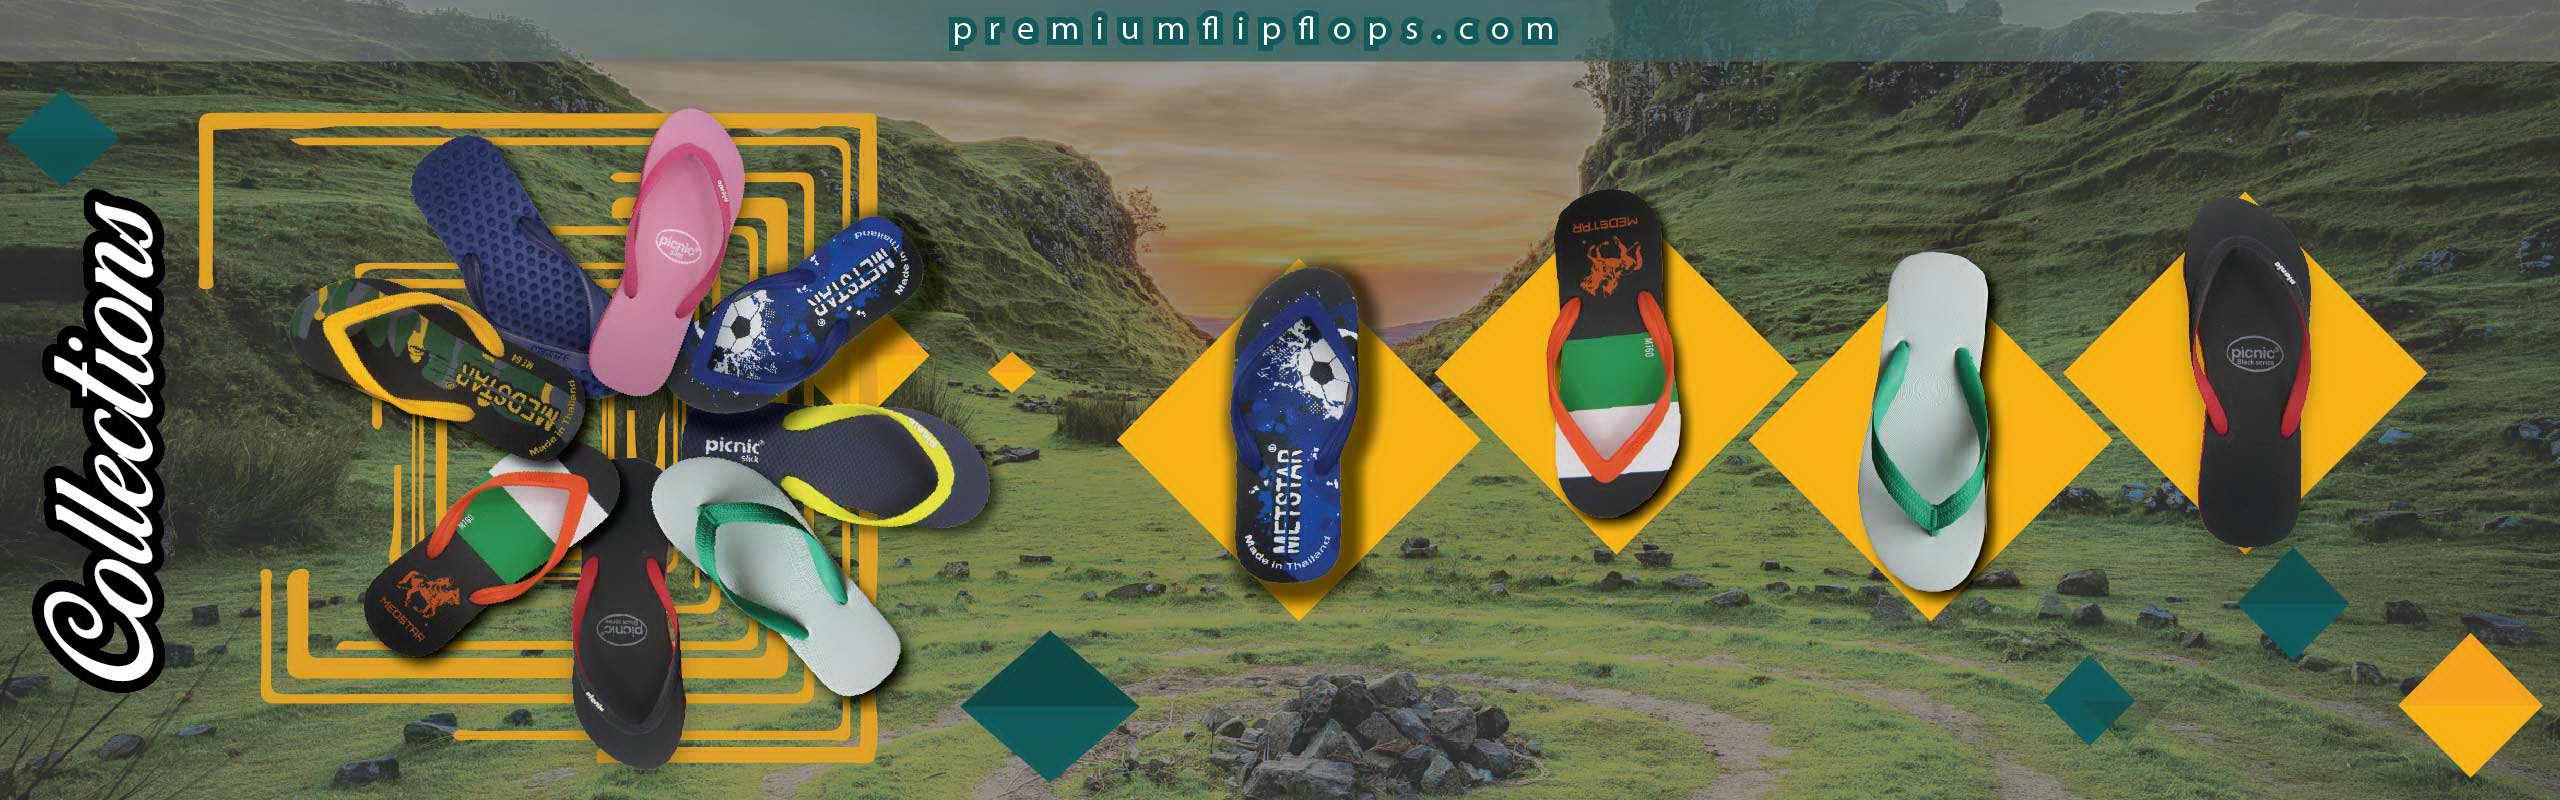 Sandal Jepit Premium Kualitas Ekspor